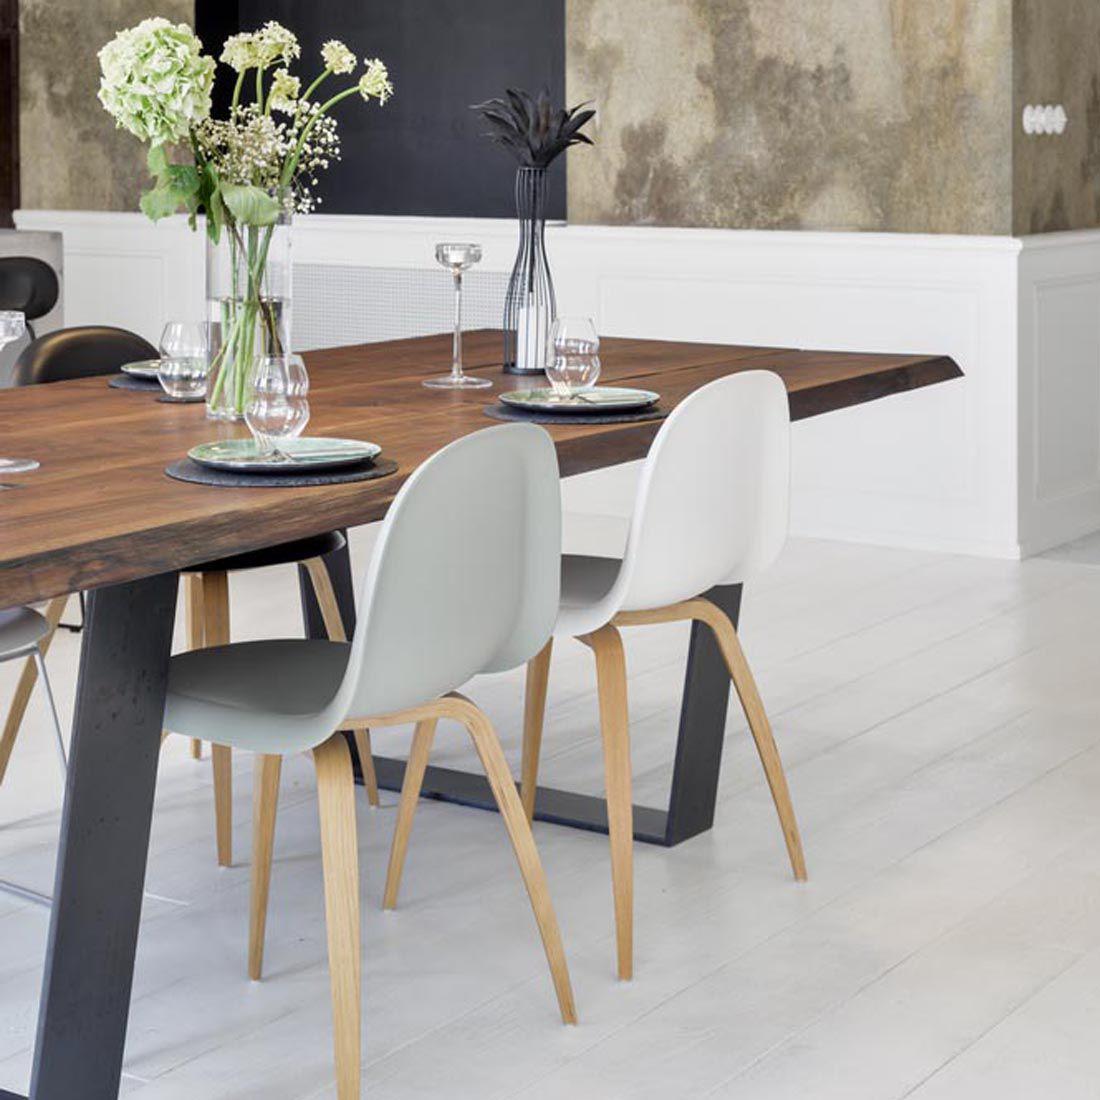 mesa de comedor contemporánea / de roble / de madera maciza / de nogal  americano